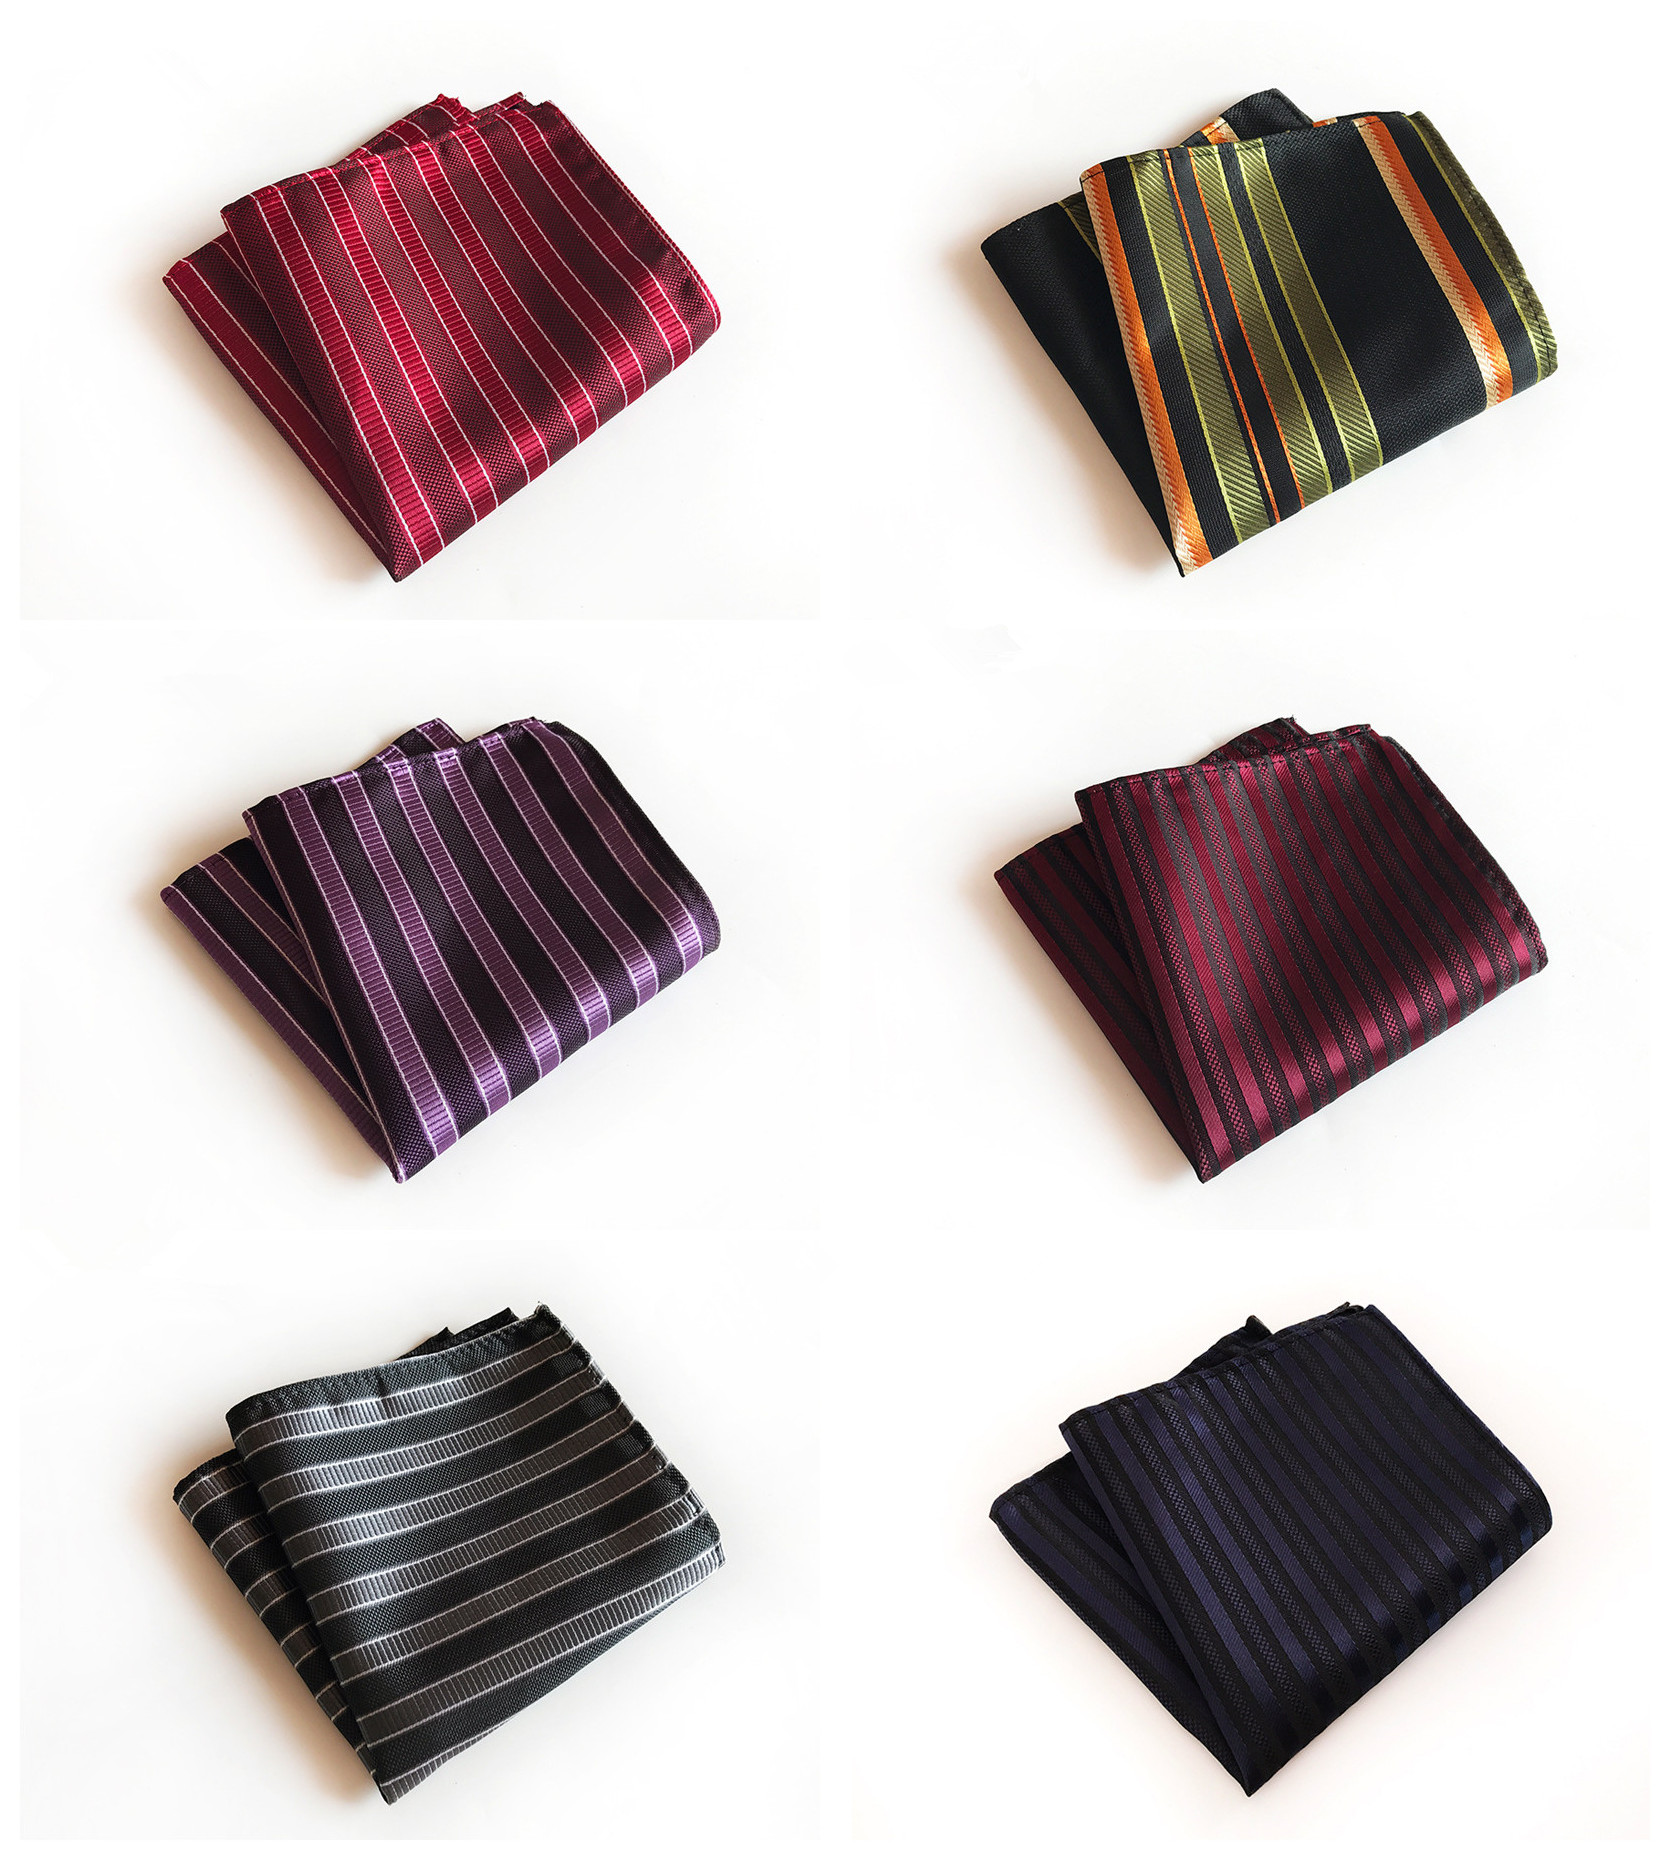 Unique Design Retro 25x25cm Polyester Pocket Towel Fashion Explosion Models Monochrome Business Dress High Quality Pocket Towel